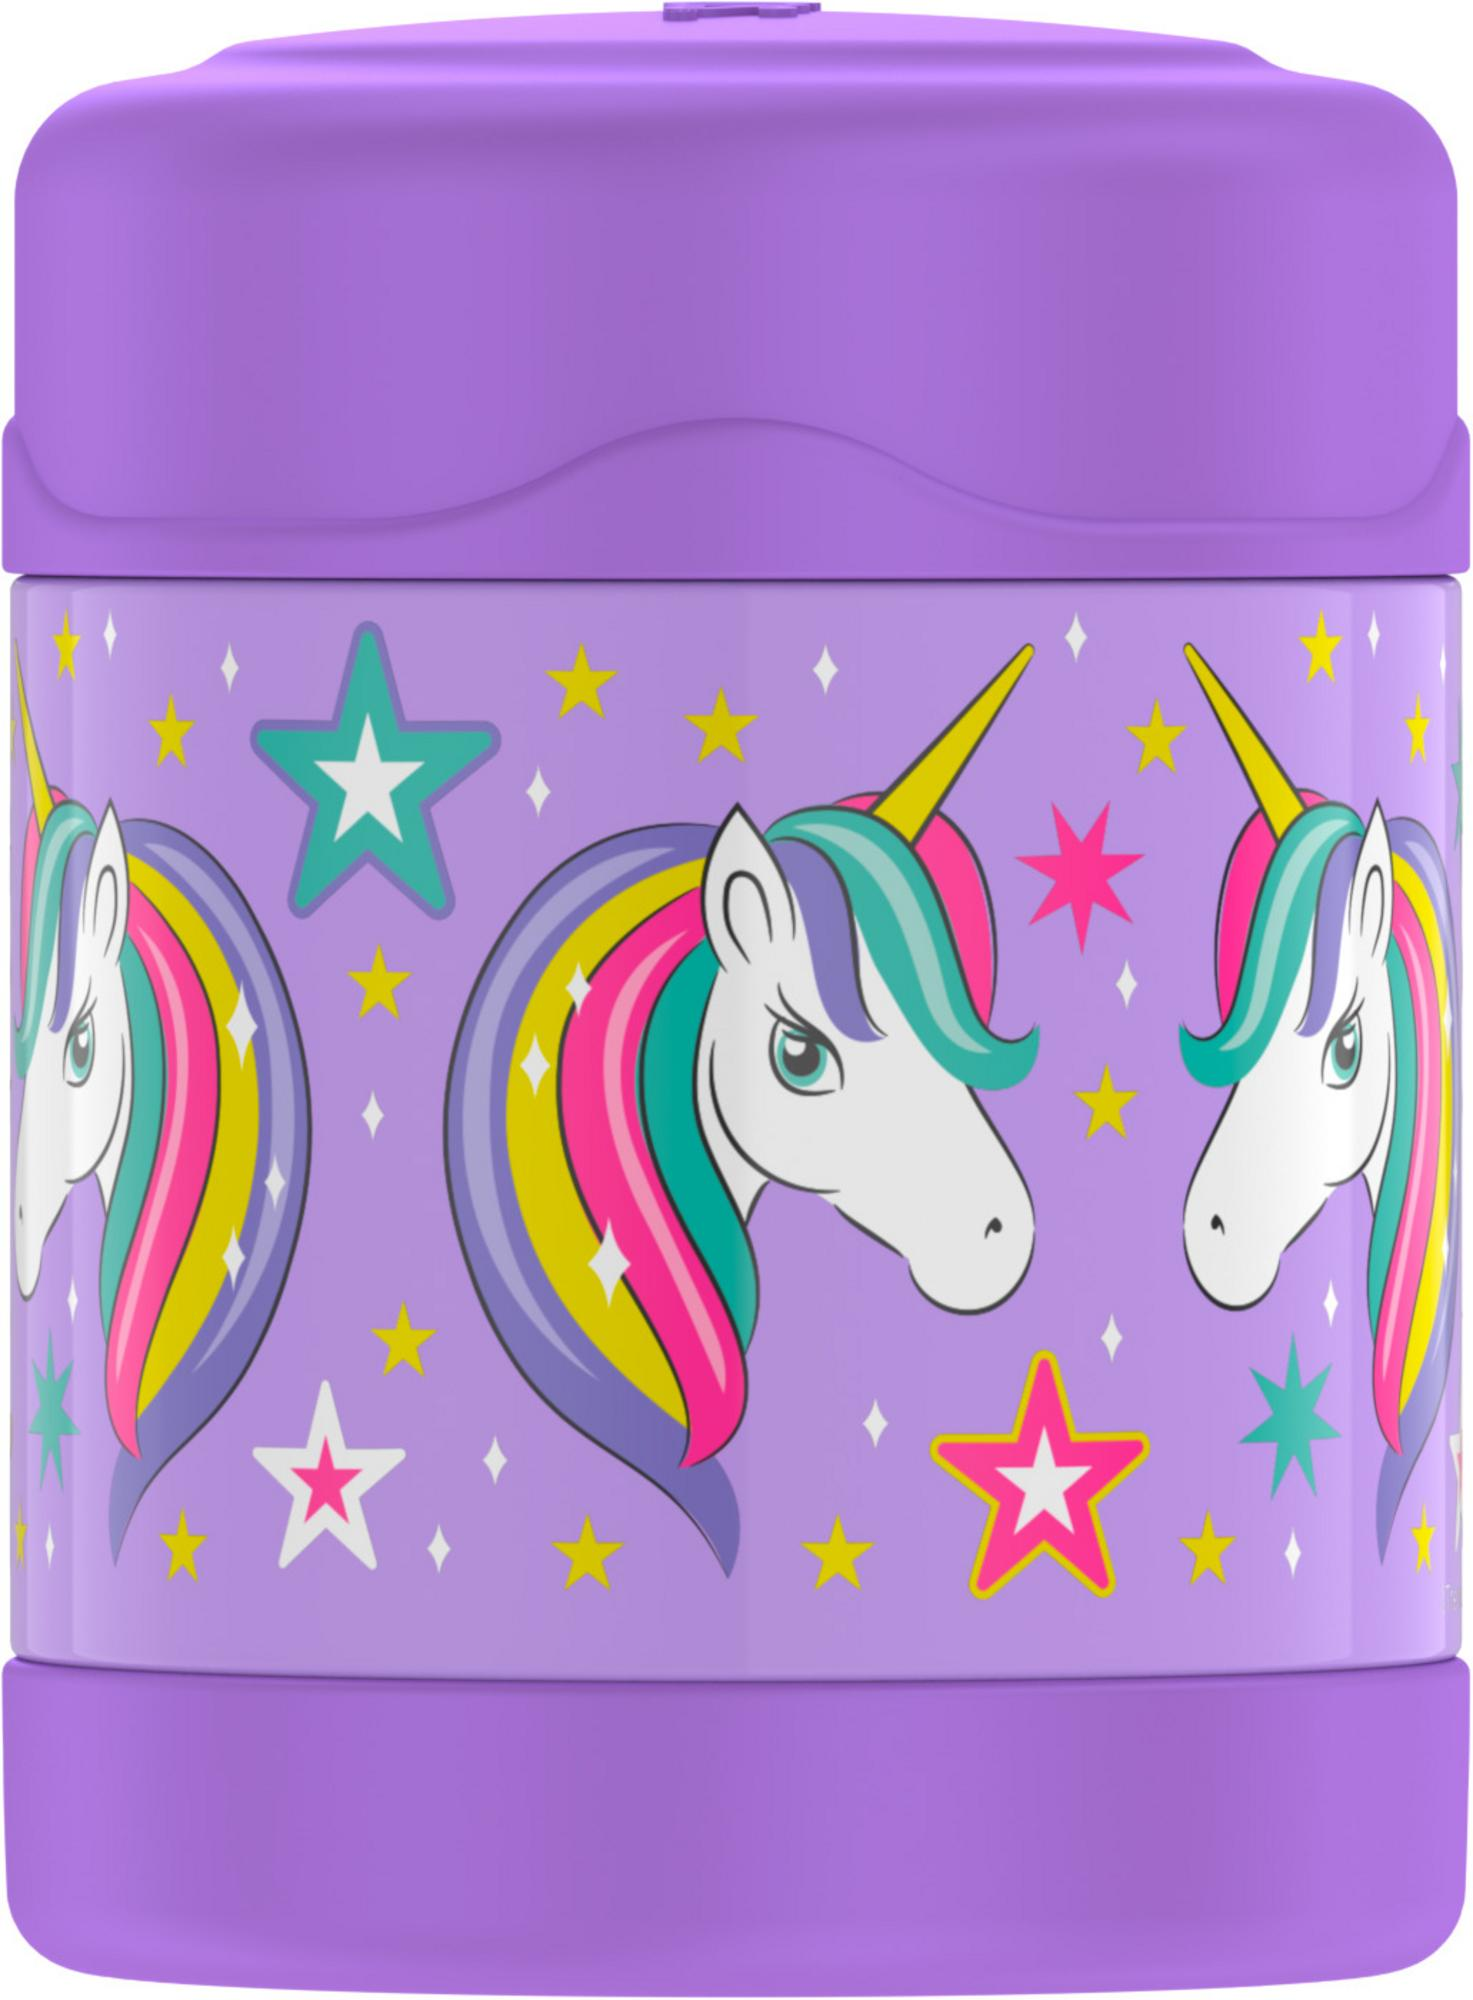 Thermos FUNTainer 12 Oz Vacuum Insulated Food Jar - Sparkle Unicorn